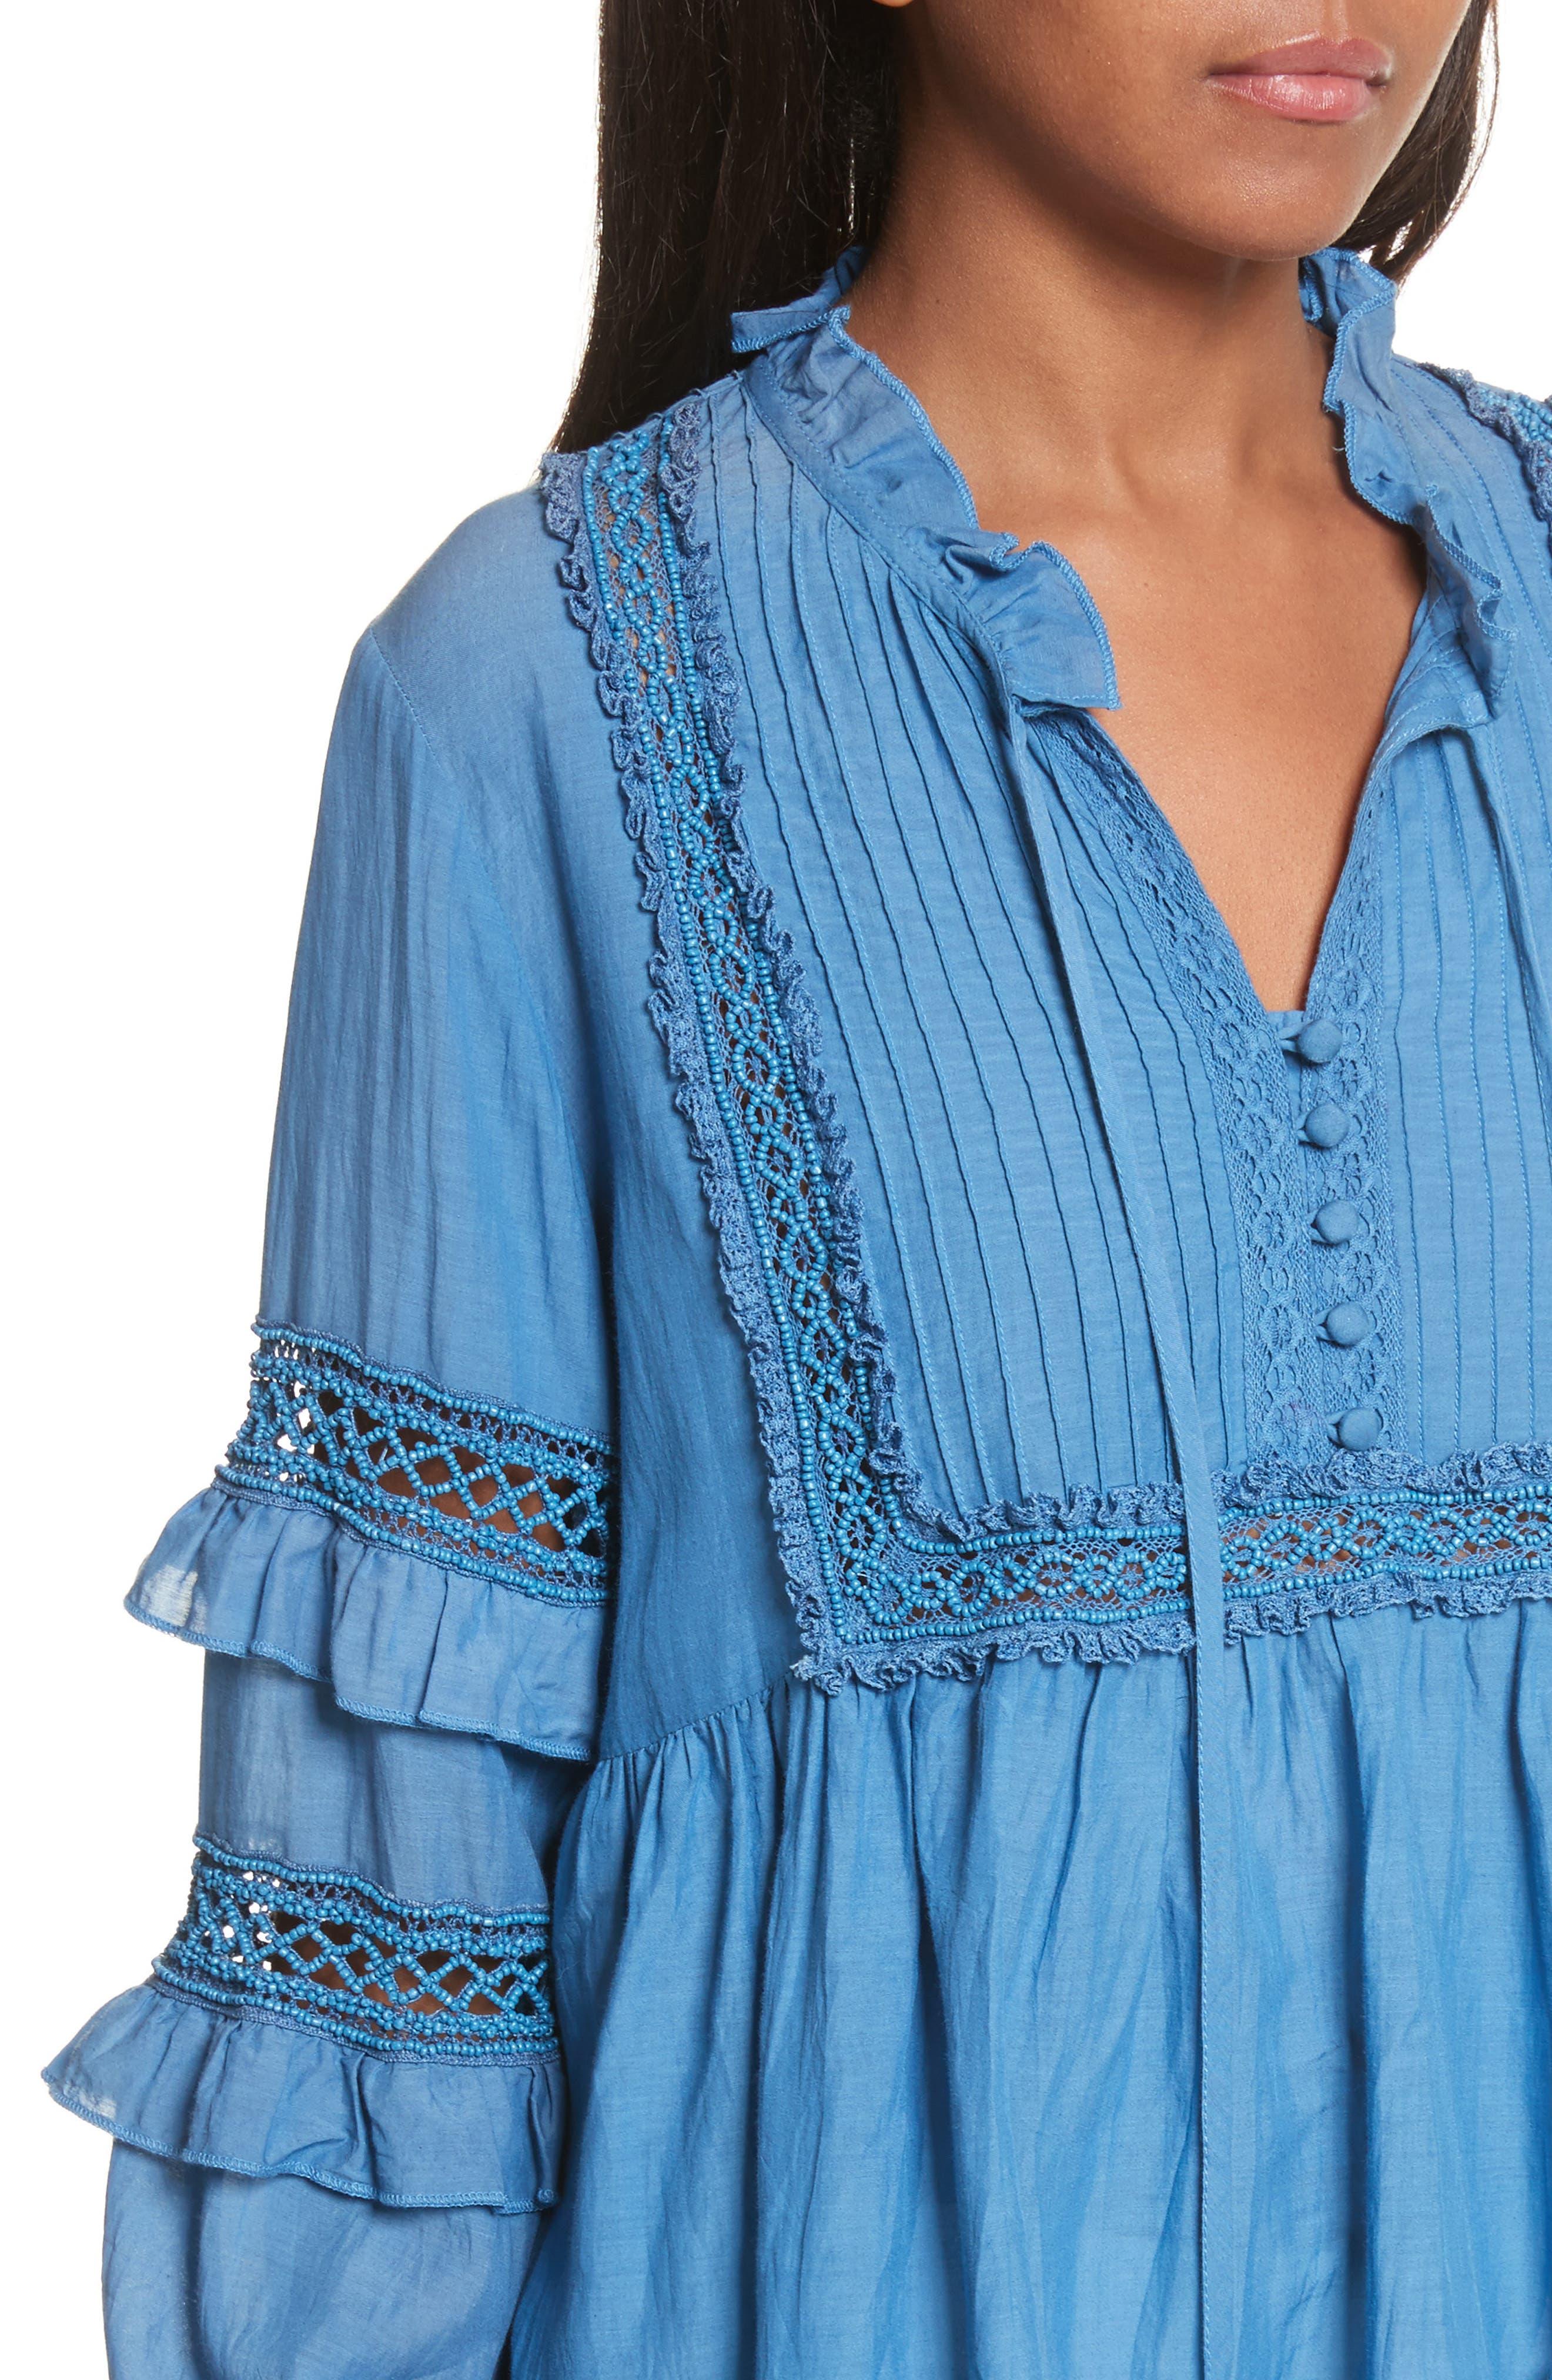 Adaline Ruffle Cotton Blouse,                             Alternate thumbnail 5, color,                             Blue